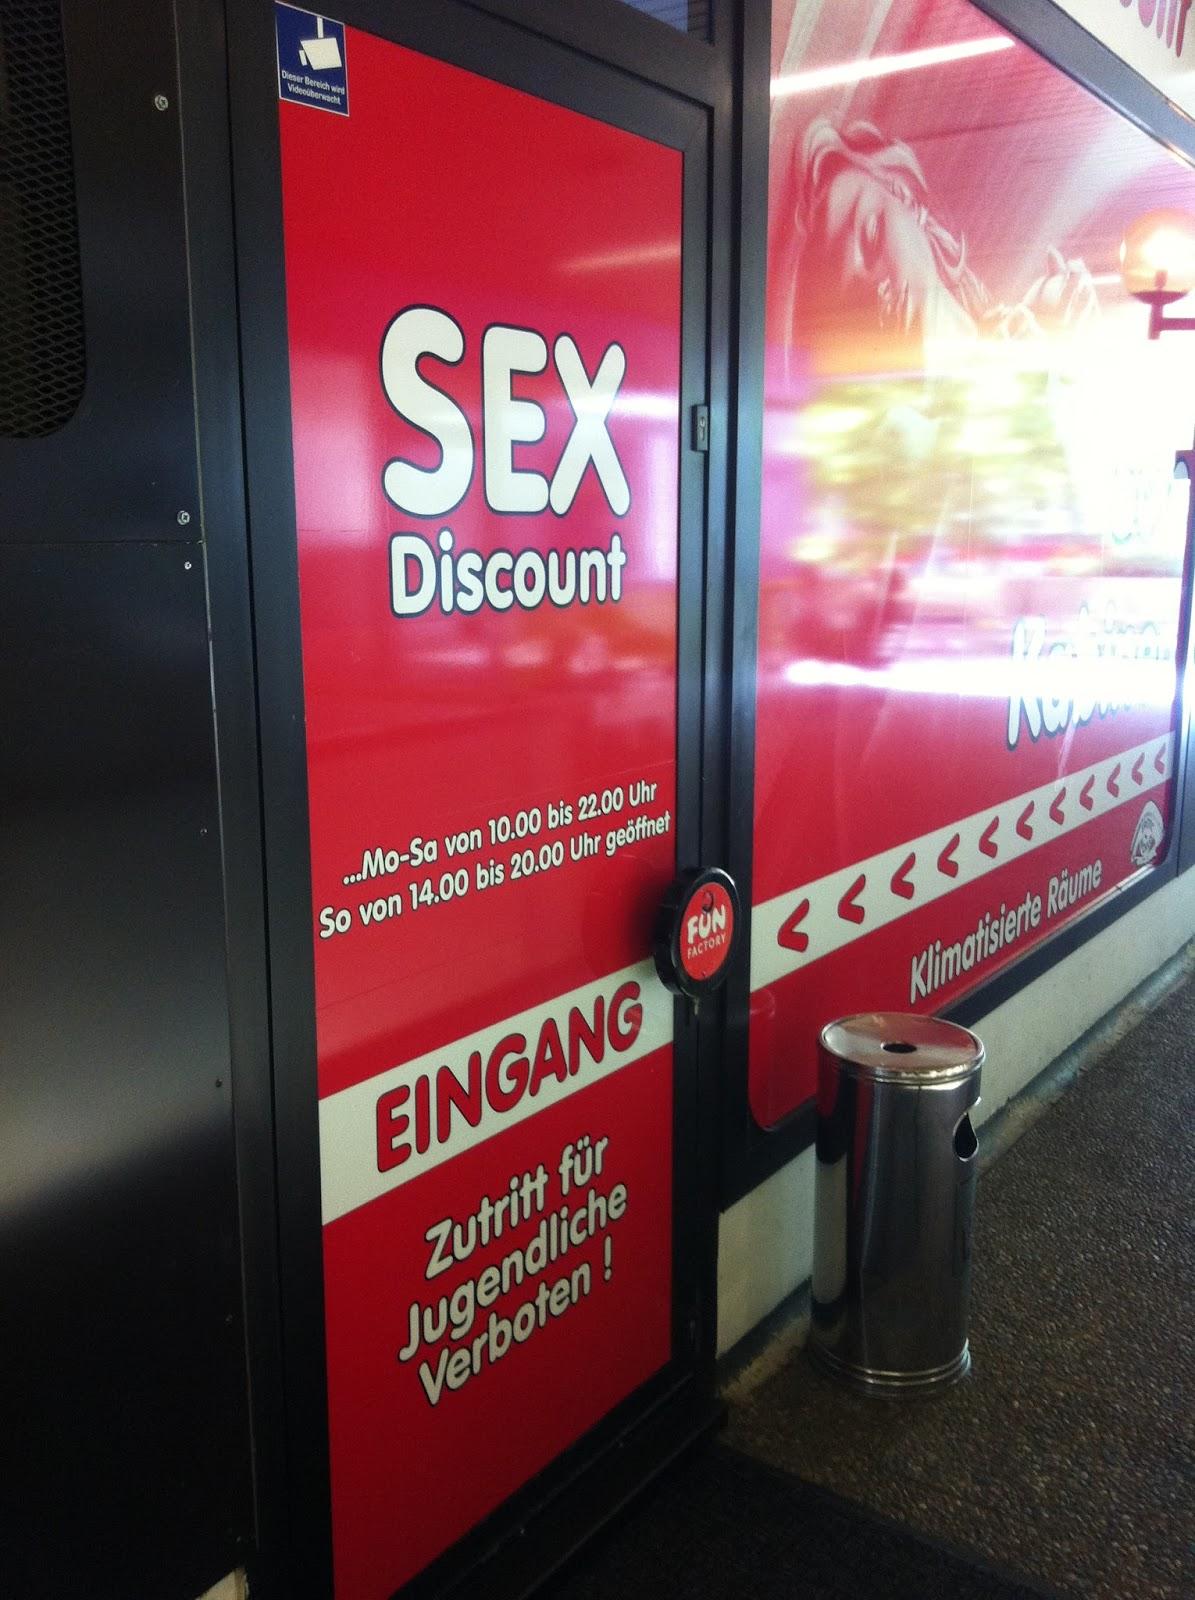 Sex bioscoop nederland